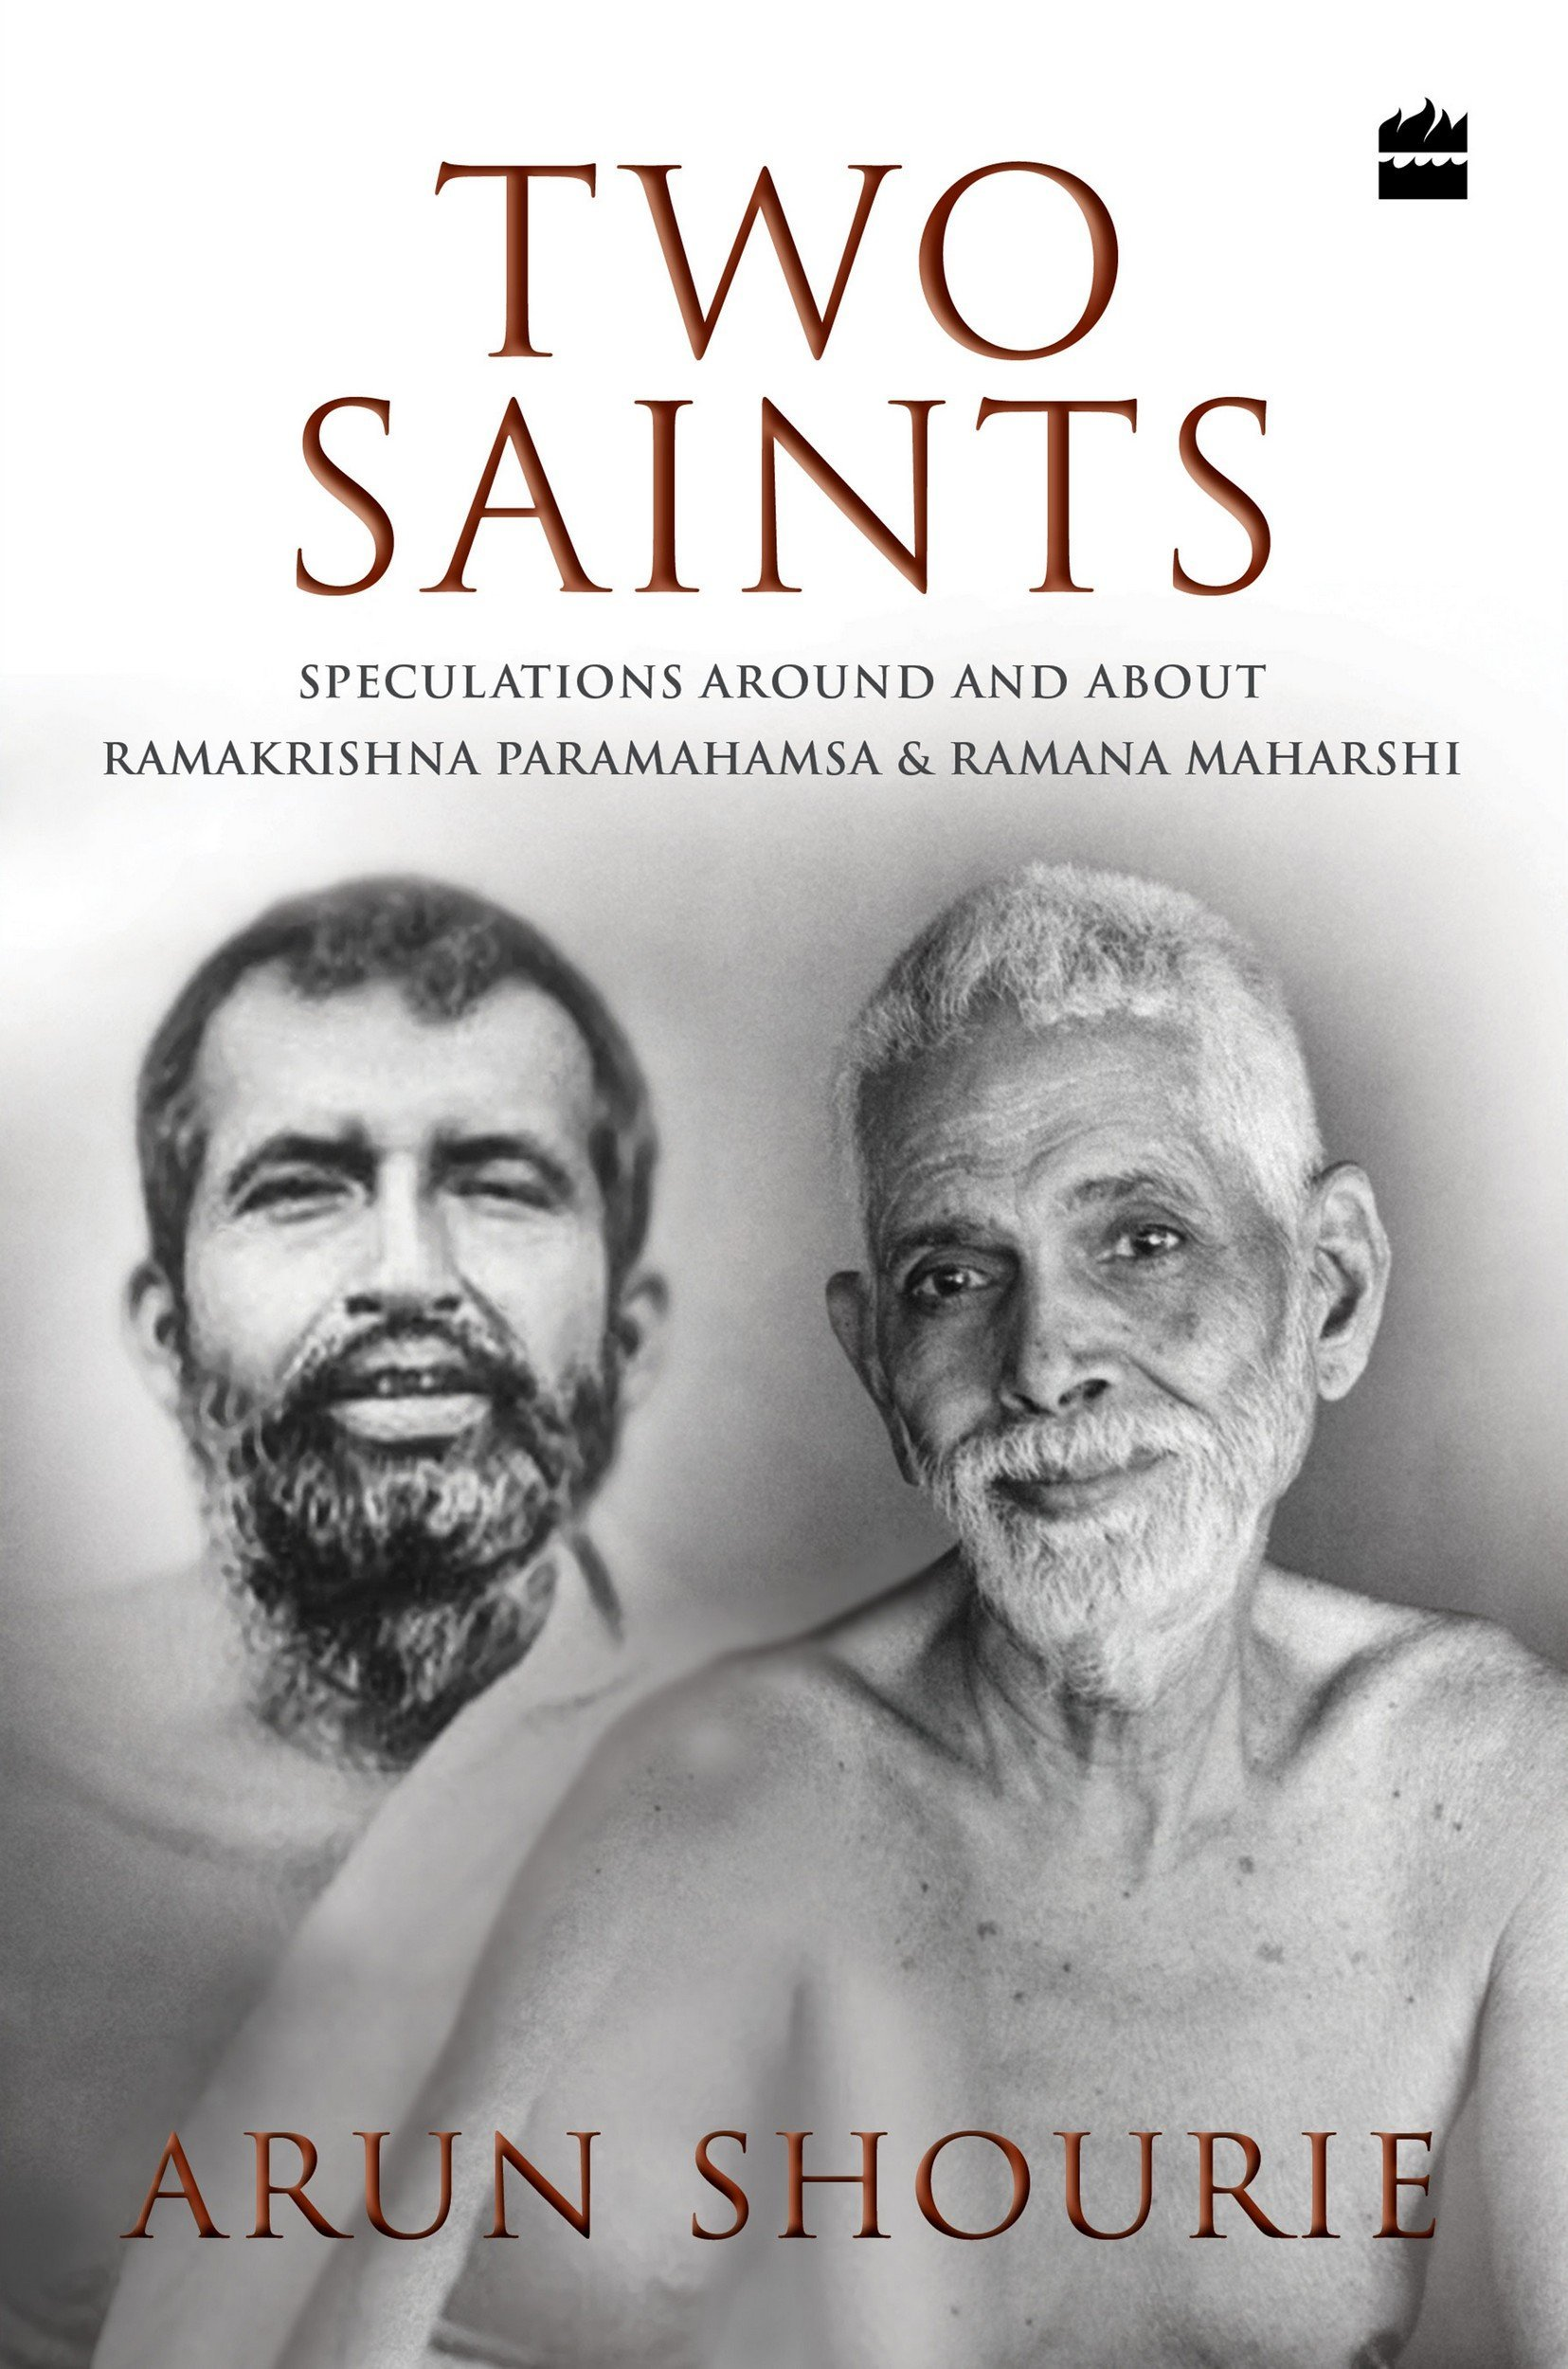 Two Saints Speculations Around and About Ramakrishna Paramahamsa and Ramana Maharishi